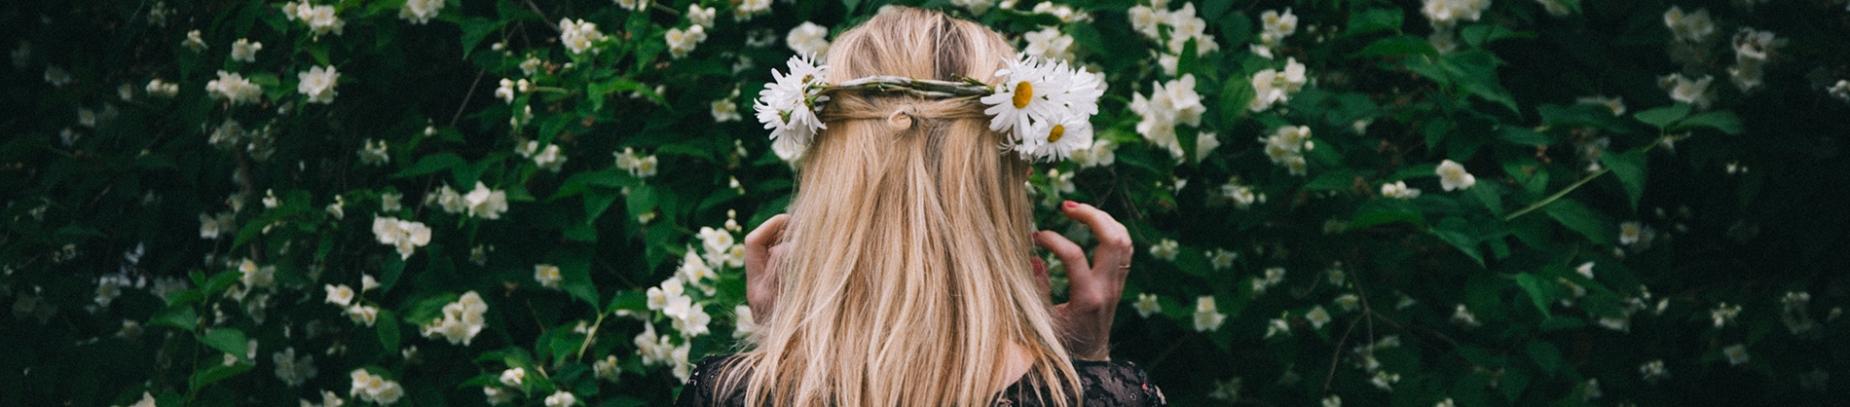 A women facing foliage wearing a flower crown